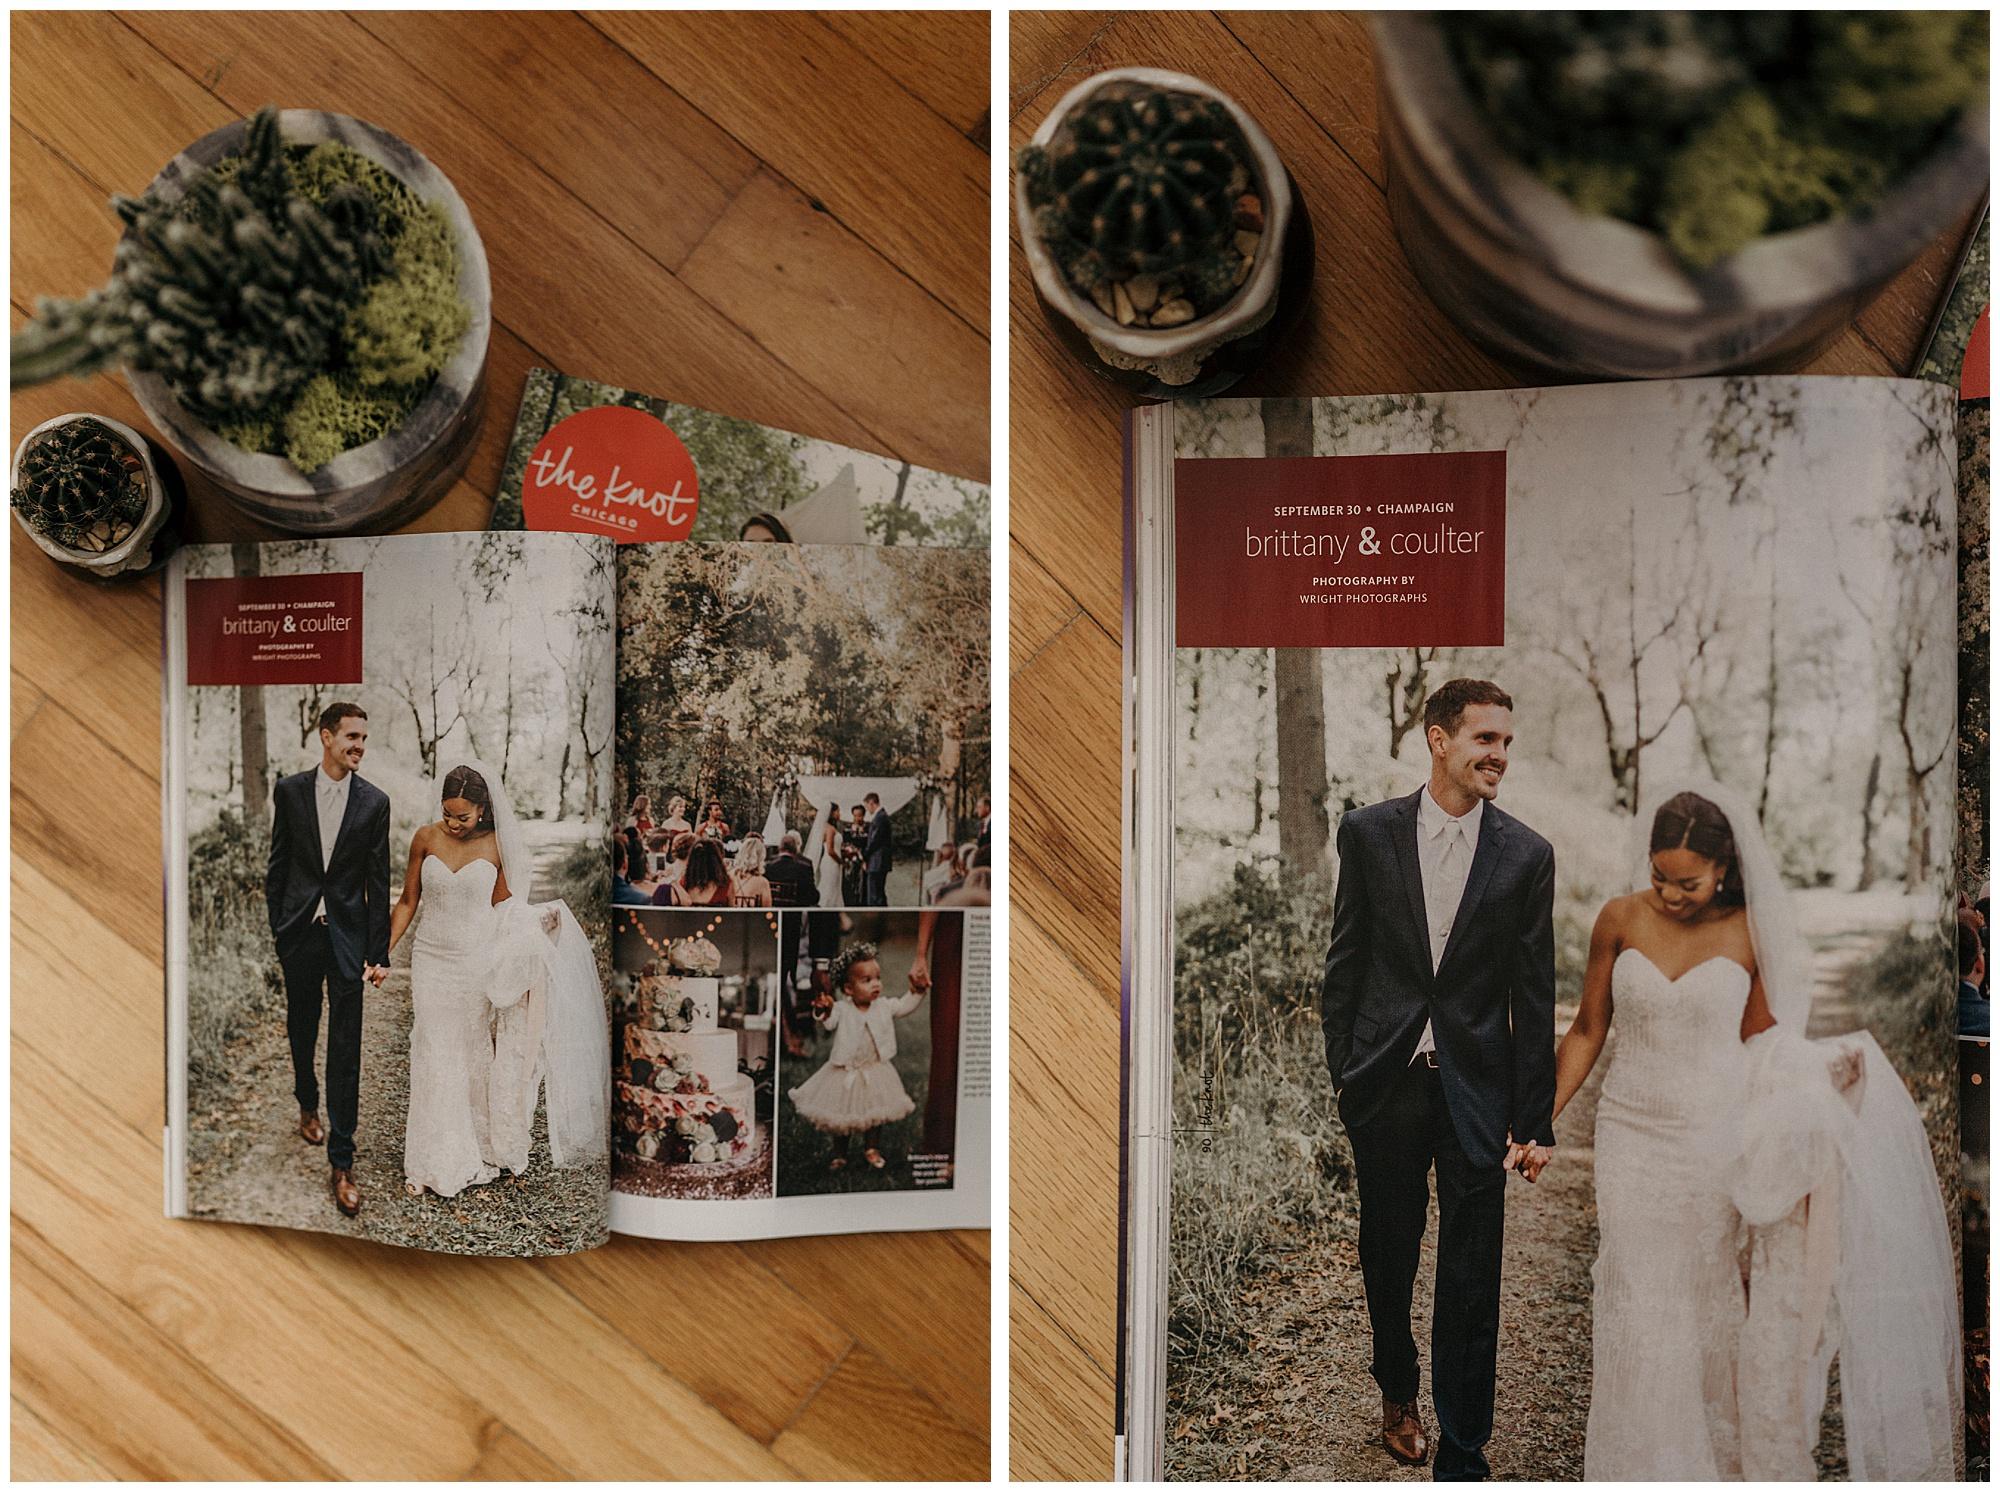 chicago_wedding_photographer_champaign_the_knot_magazine_prairie_glass_house_wright_photographs_0005.jpg